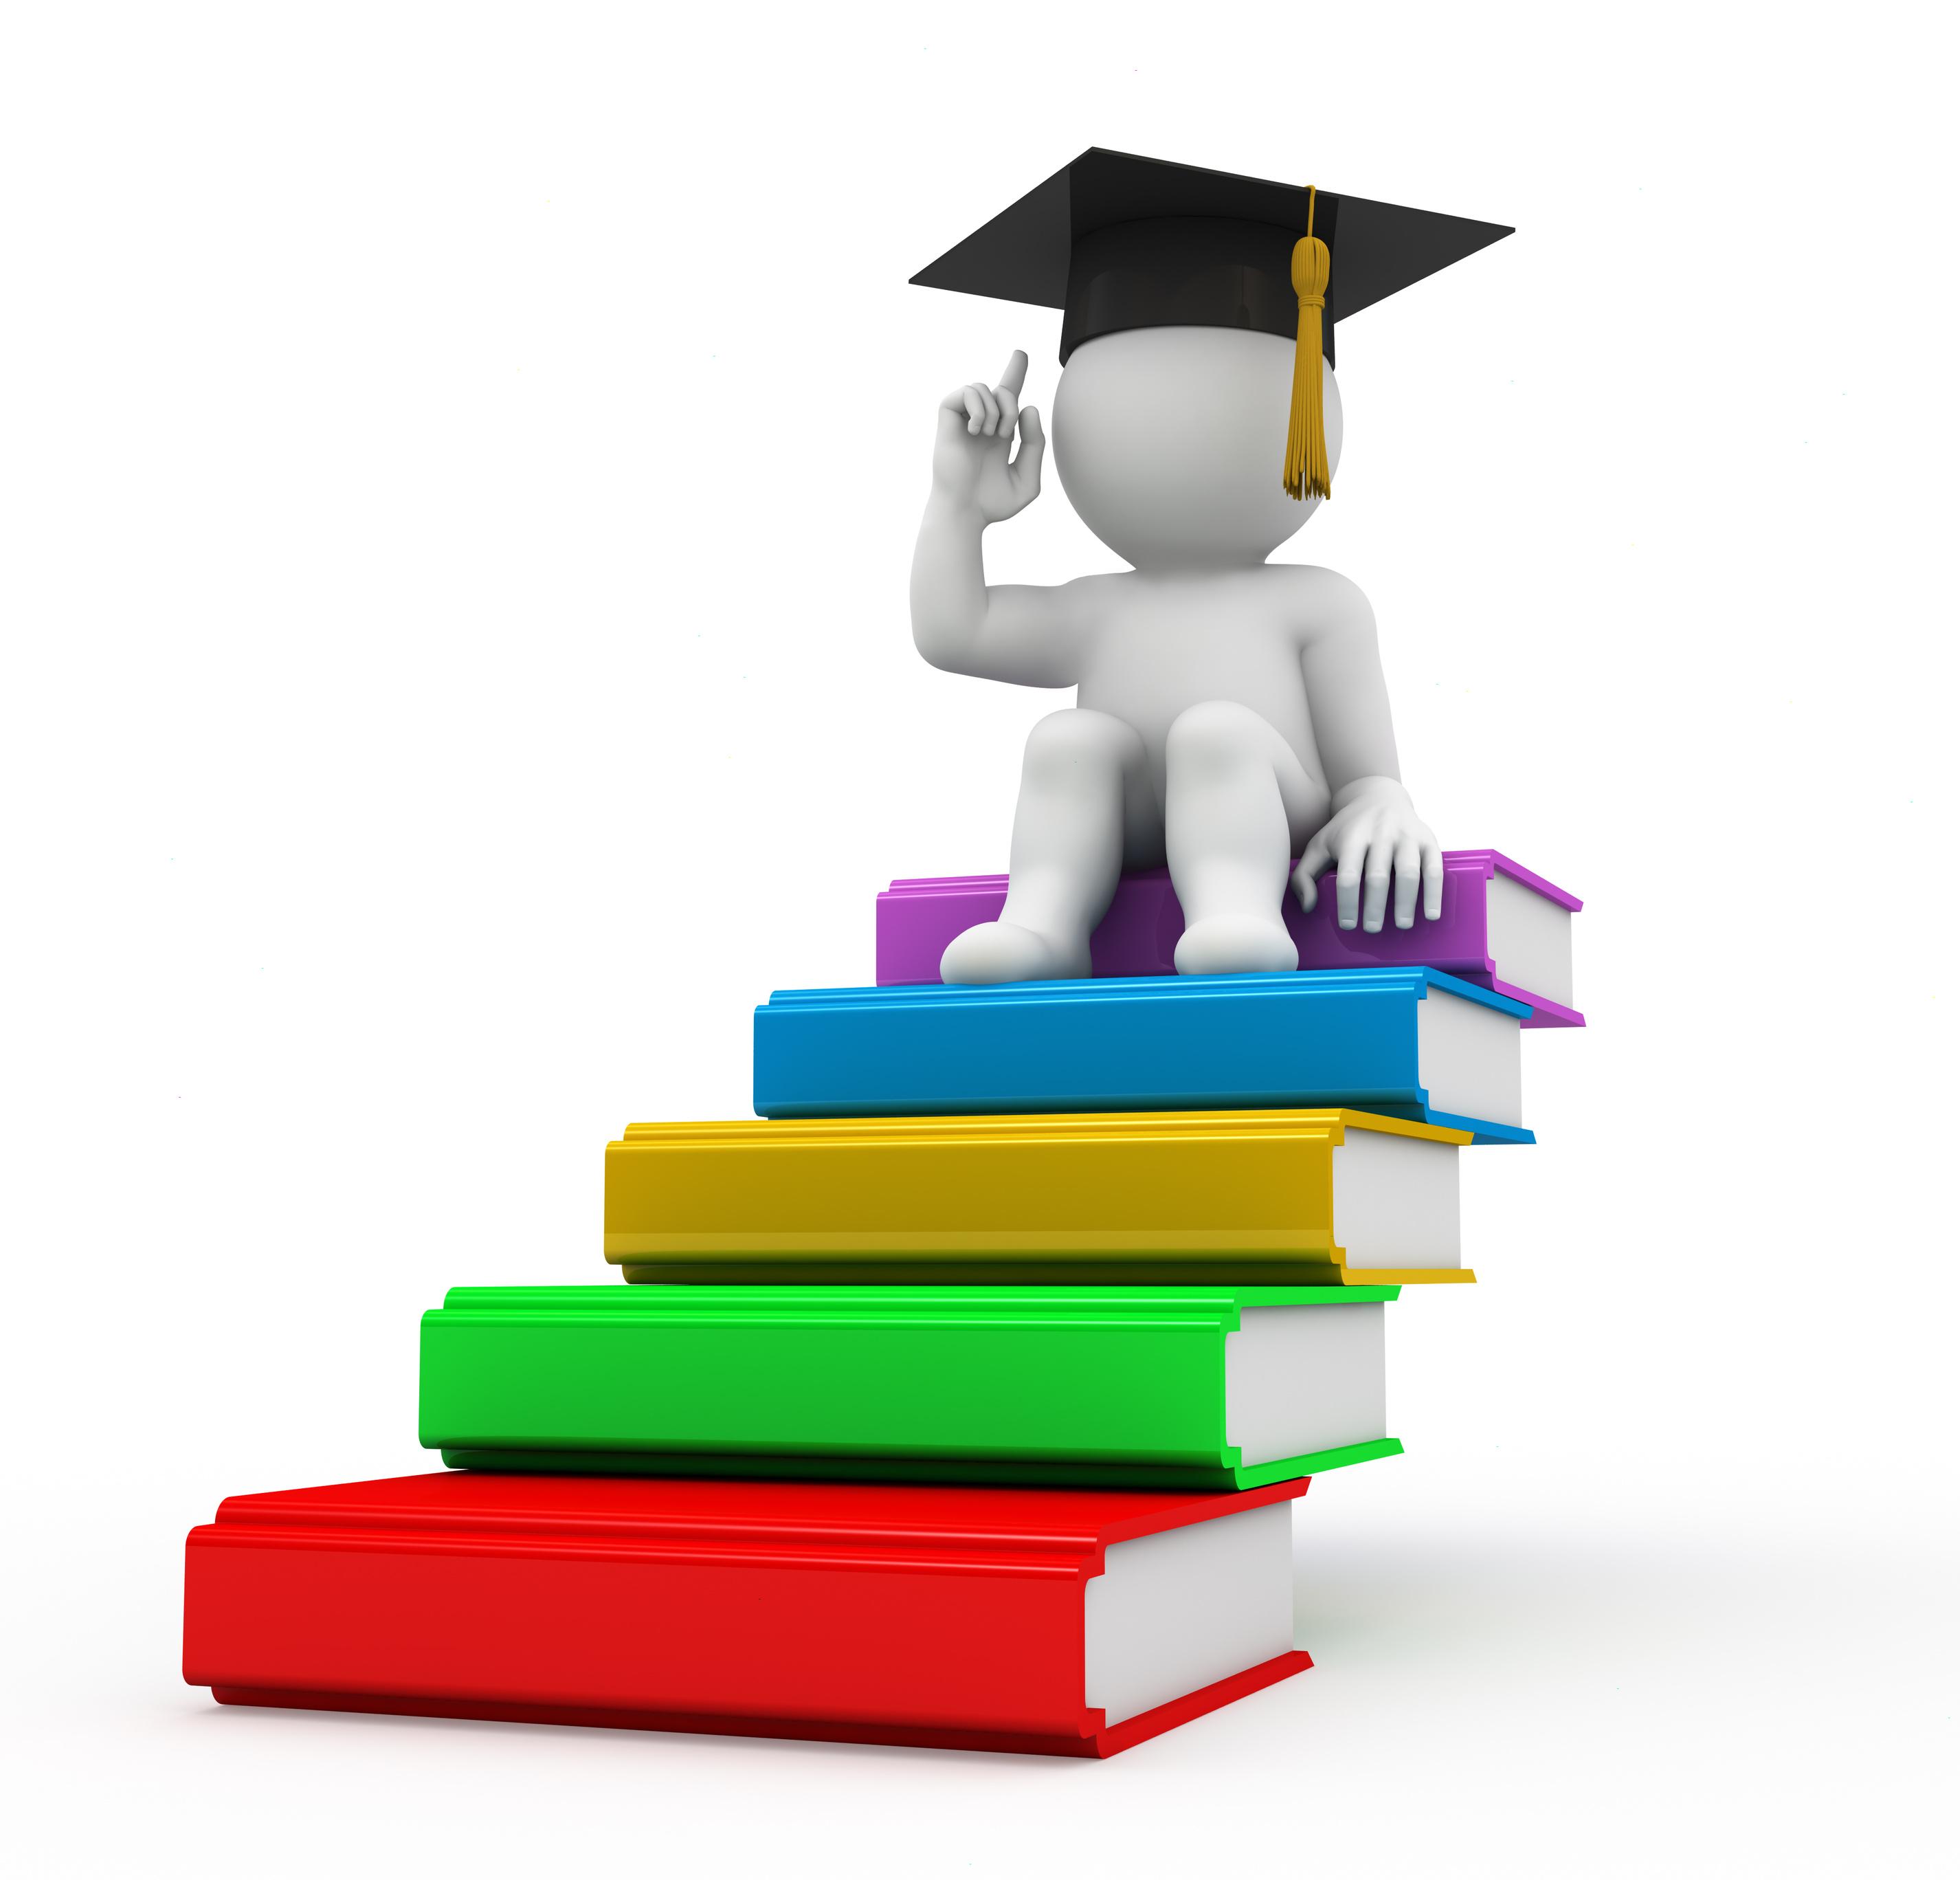 2852x2735 Kp Mulls Legislation To Make Education Compulsory For Kids